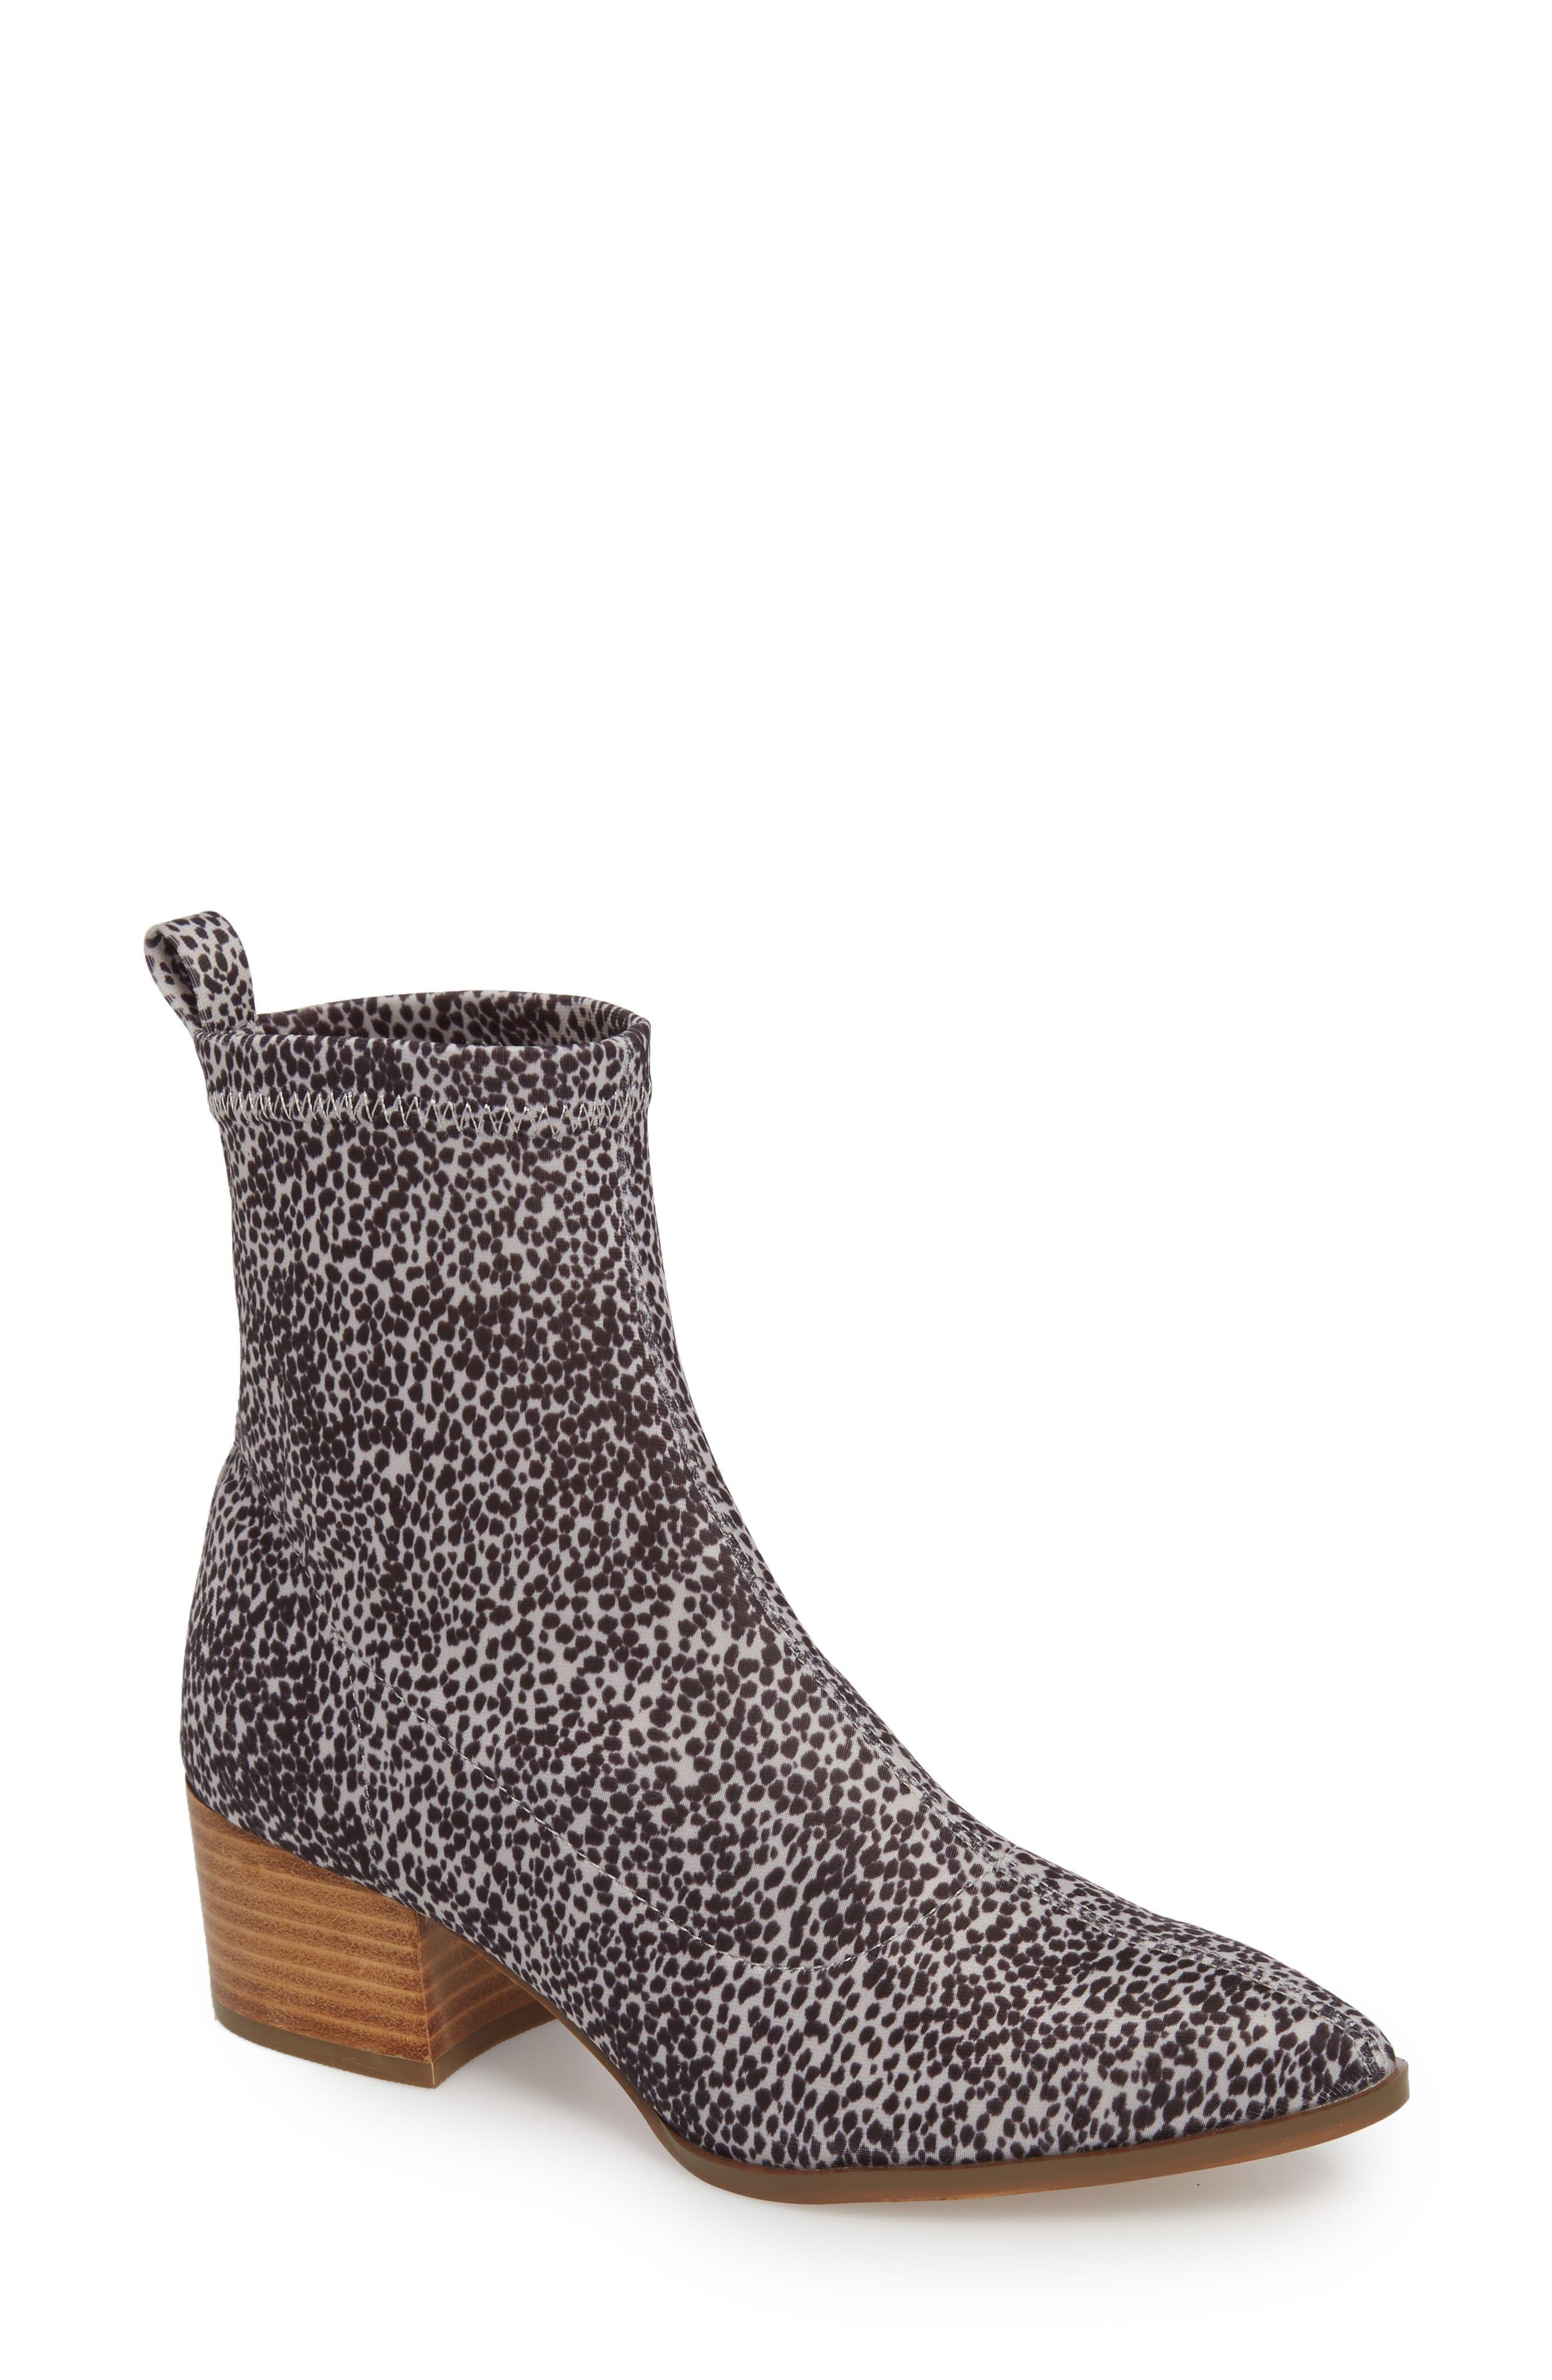 Amuse Society x Matisse Liliana Sock Bootie (Women)